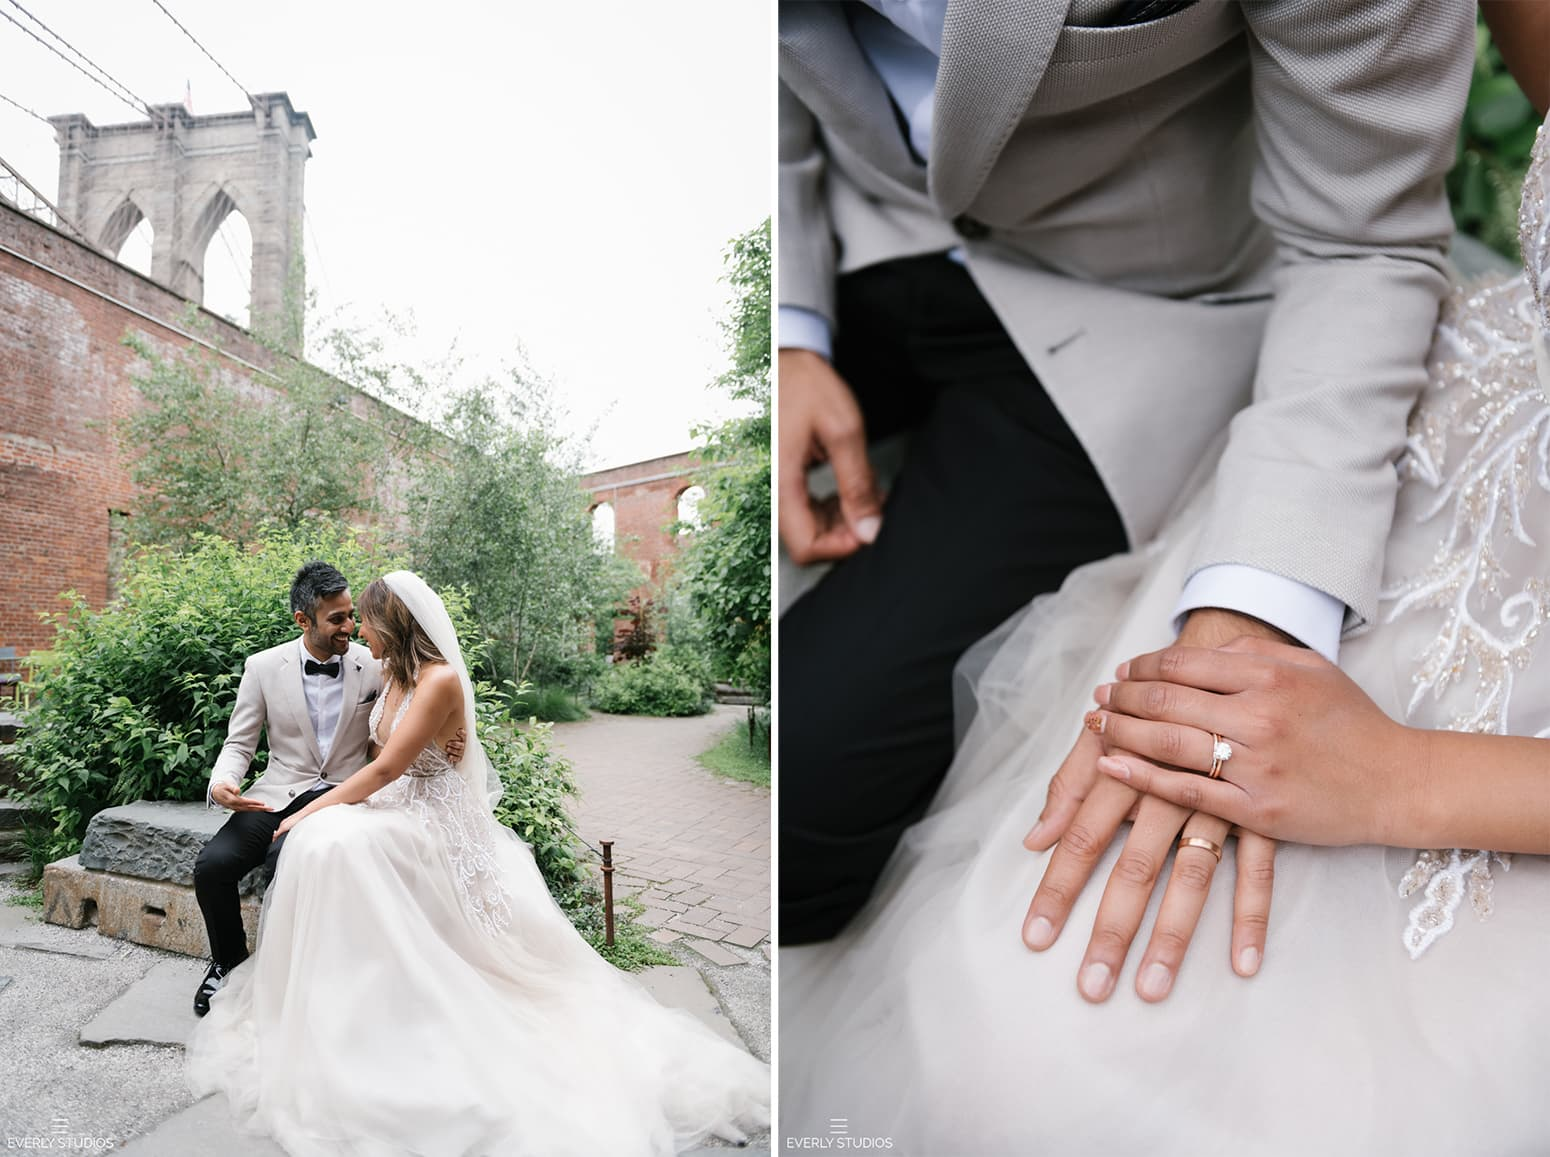 Brooklyn Bridge Park wedding photos. Photo by NYC wedding photographer Everly Studios, www.everlystudios.com